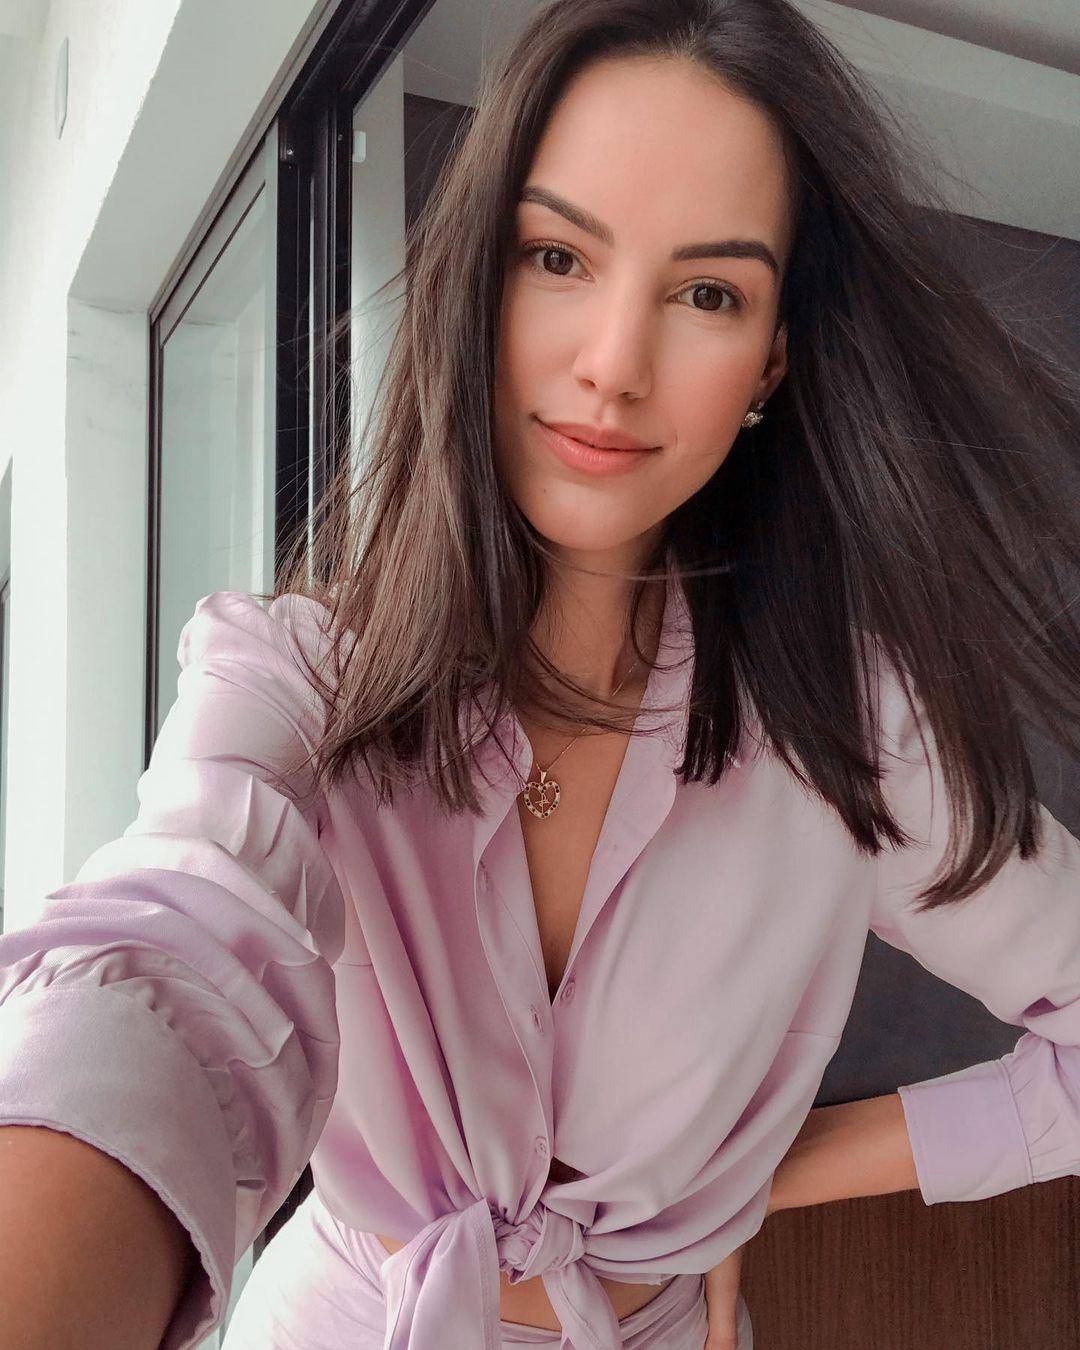 rafaella felipe, top 20 de miss brasil mundo 2019. - Página 3 Qtdk6q10